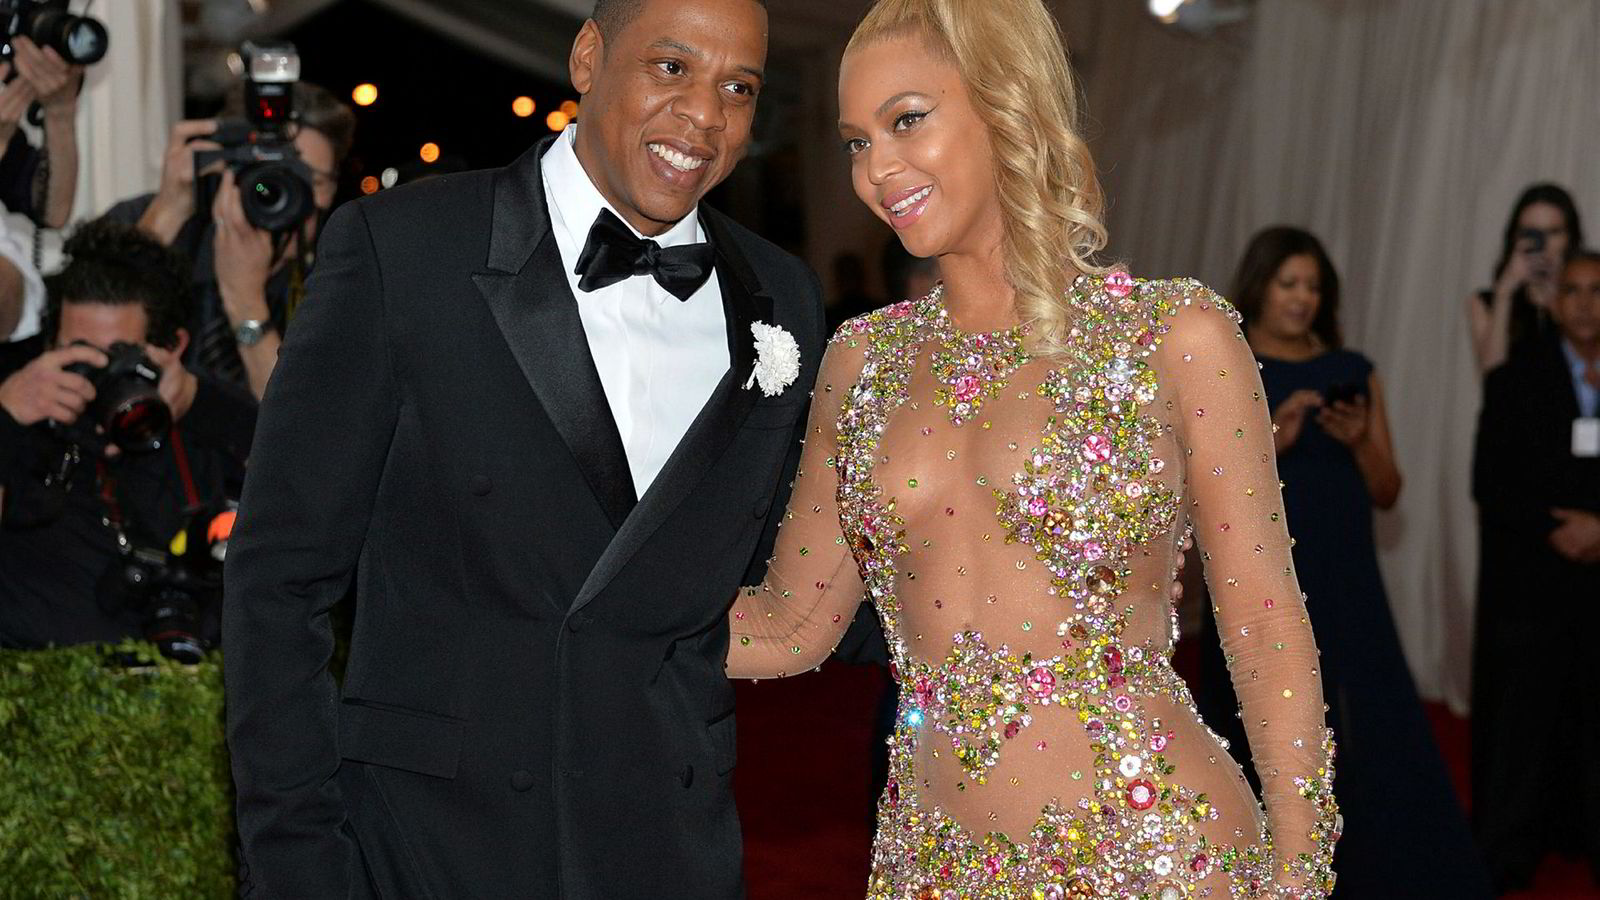 Rapperen Jay Z (Shawn Carter) eier musikkstrømmetjenesten Tidal. Her sammen med kona og superstjernen Beyoncé Knowles-Carter.